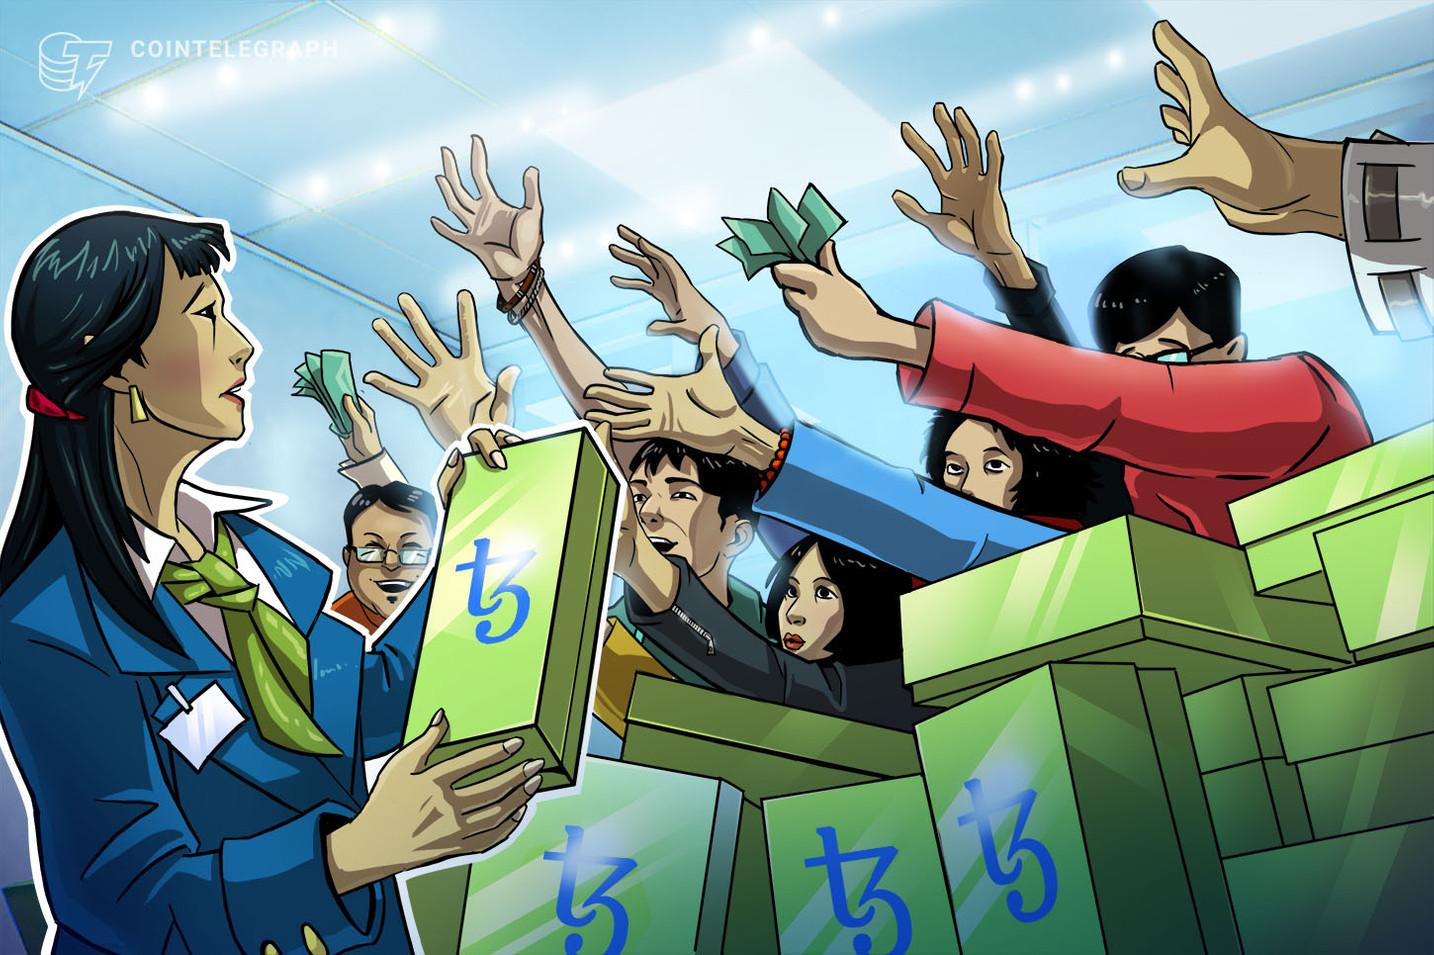 Trading Platform EToro Adds Support for Tezos Amid Price Surge